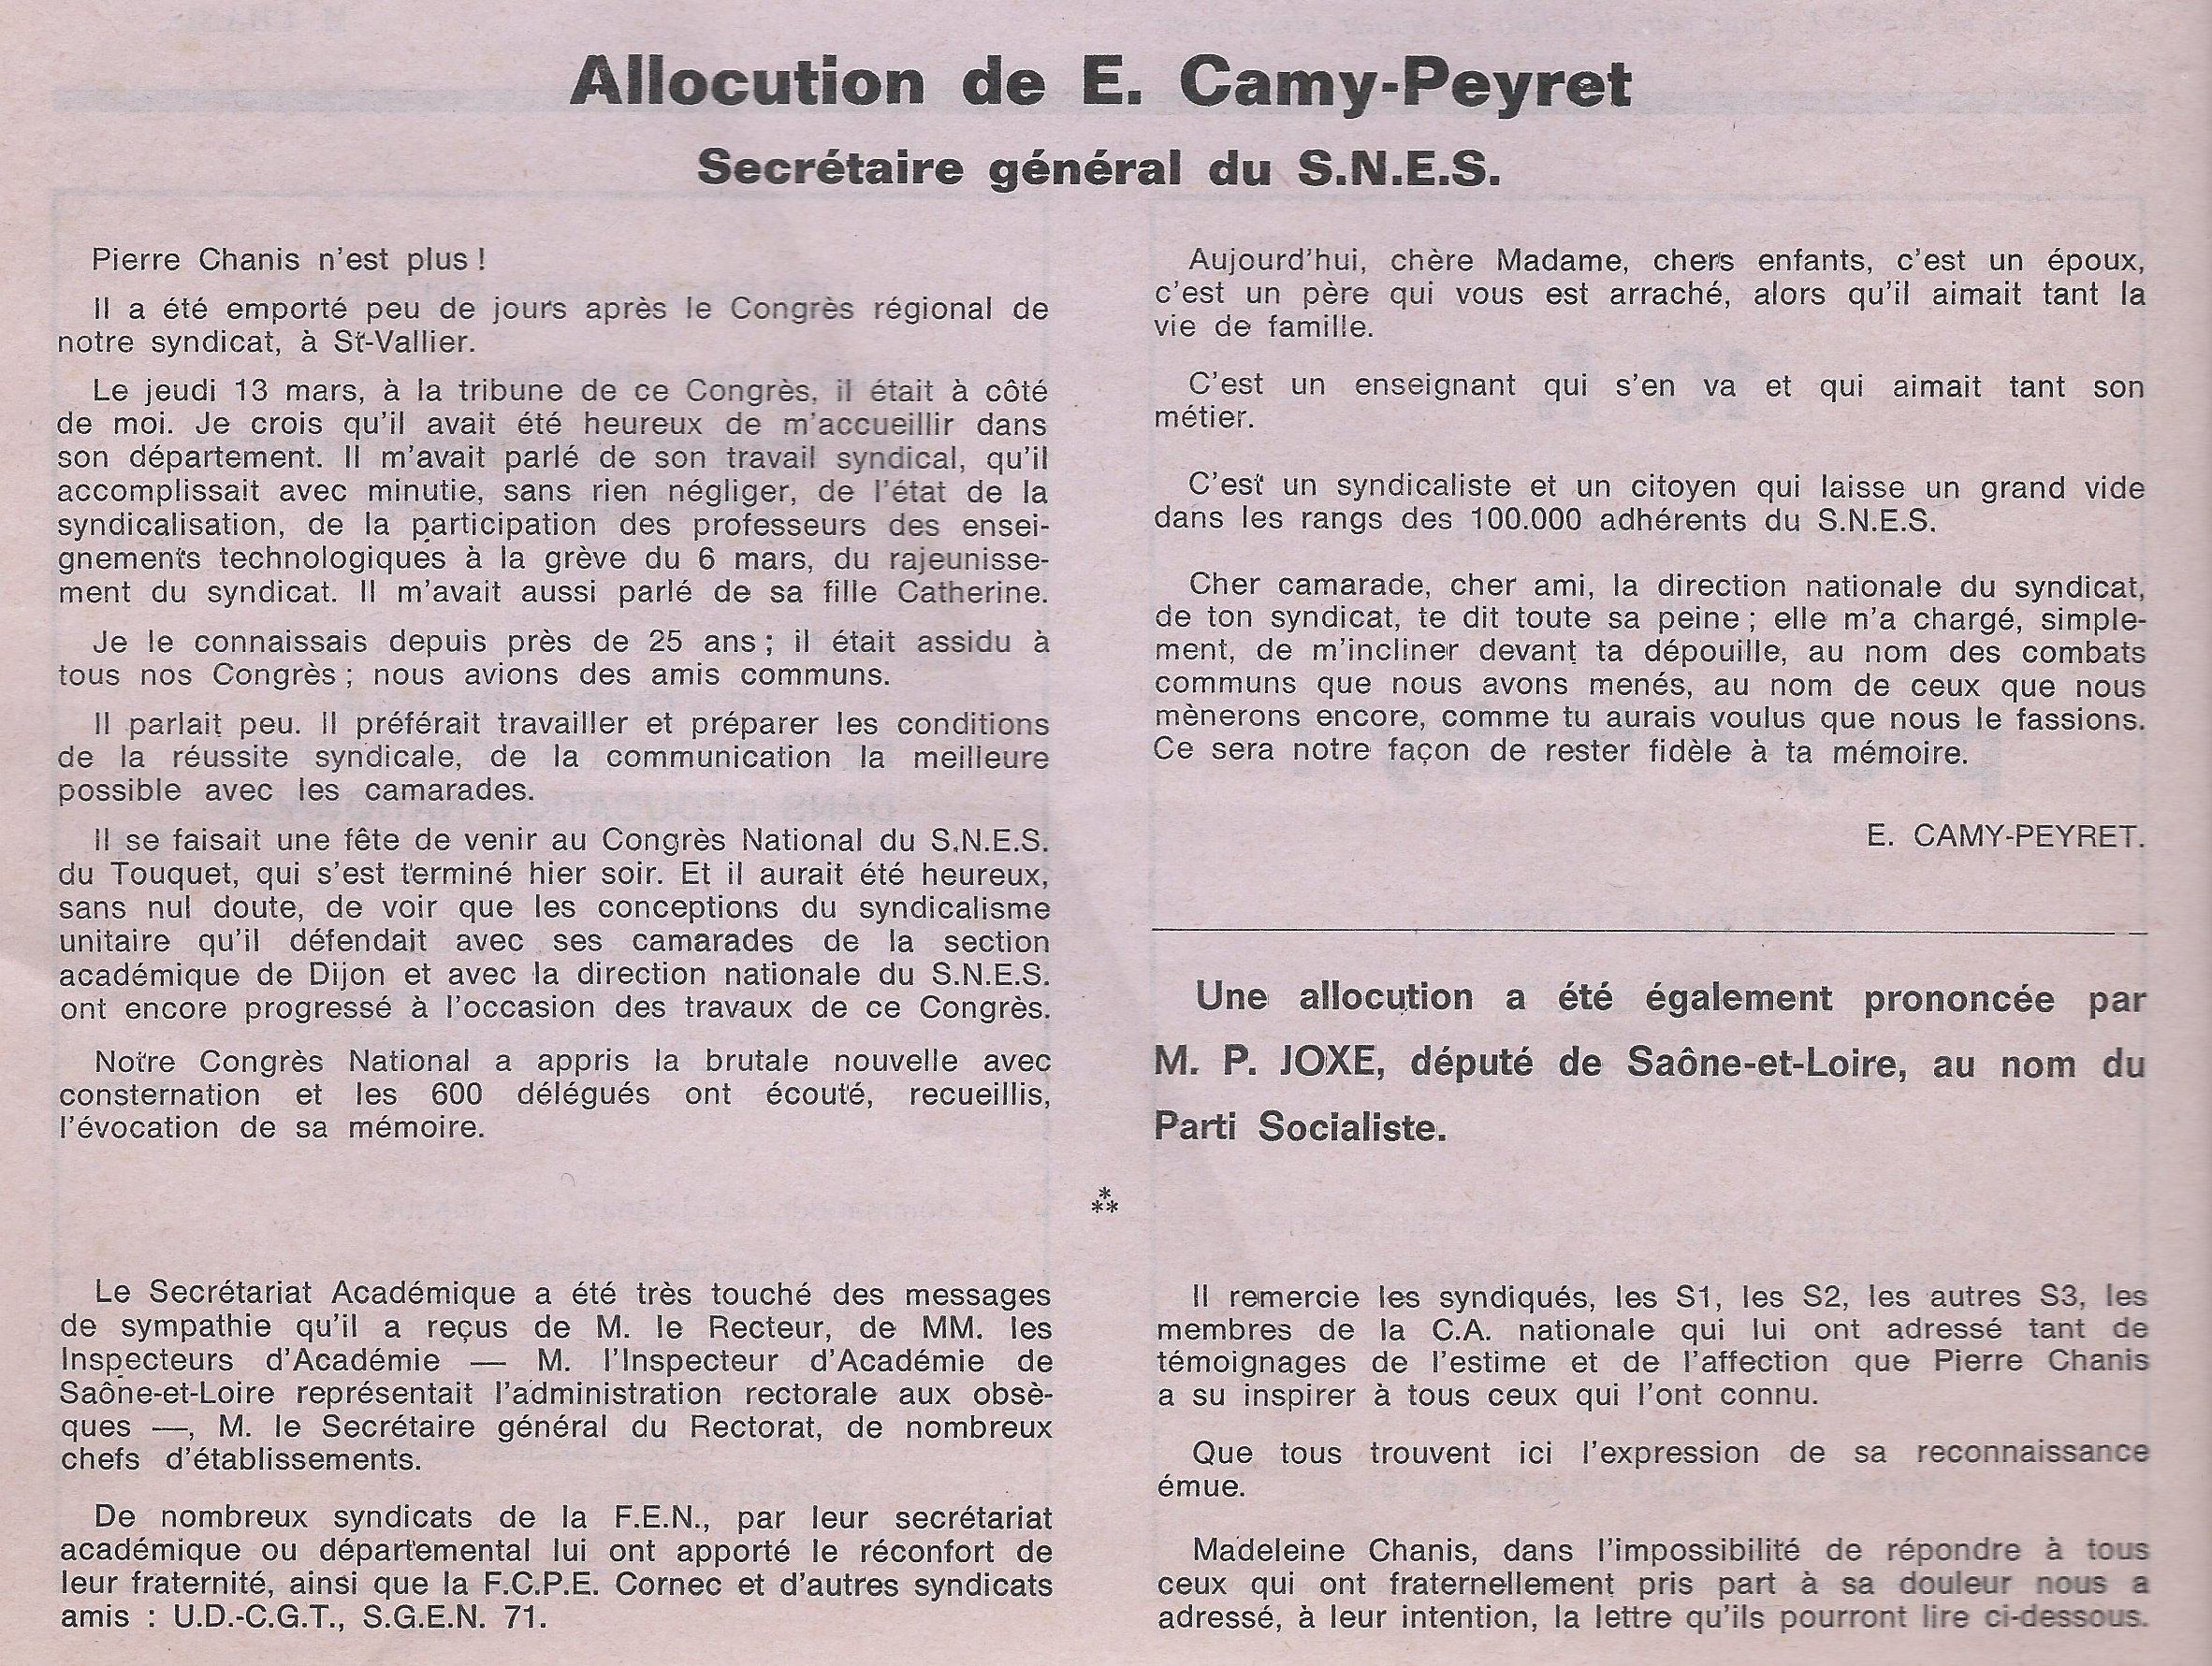 0003_Camy_Peyret_Chanis.JPG